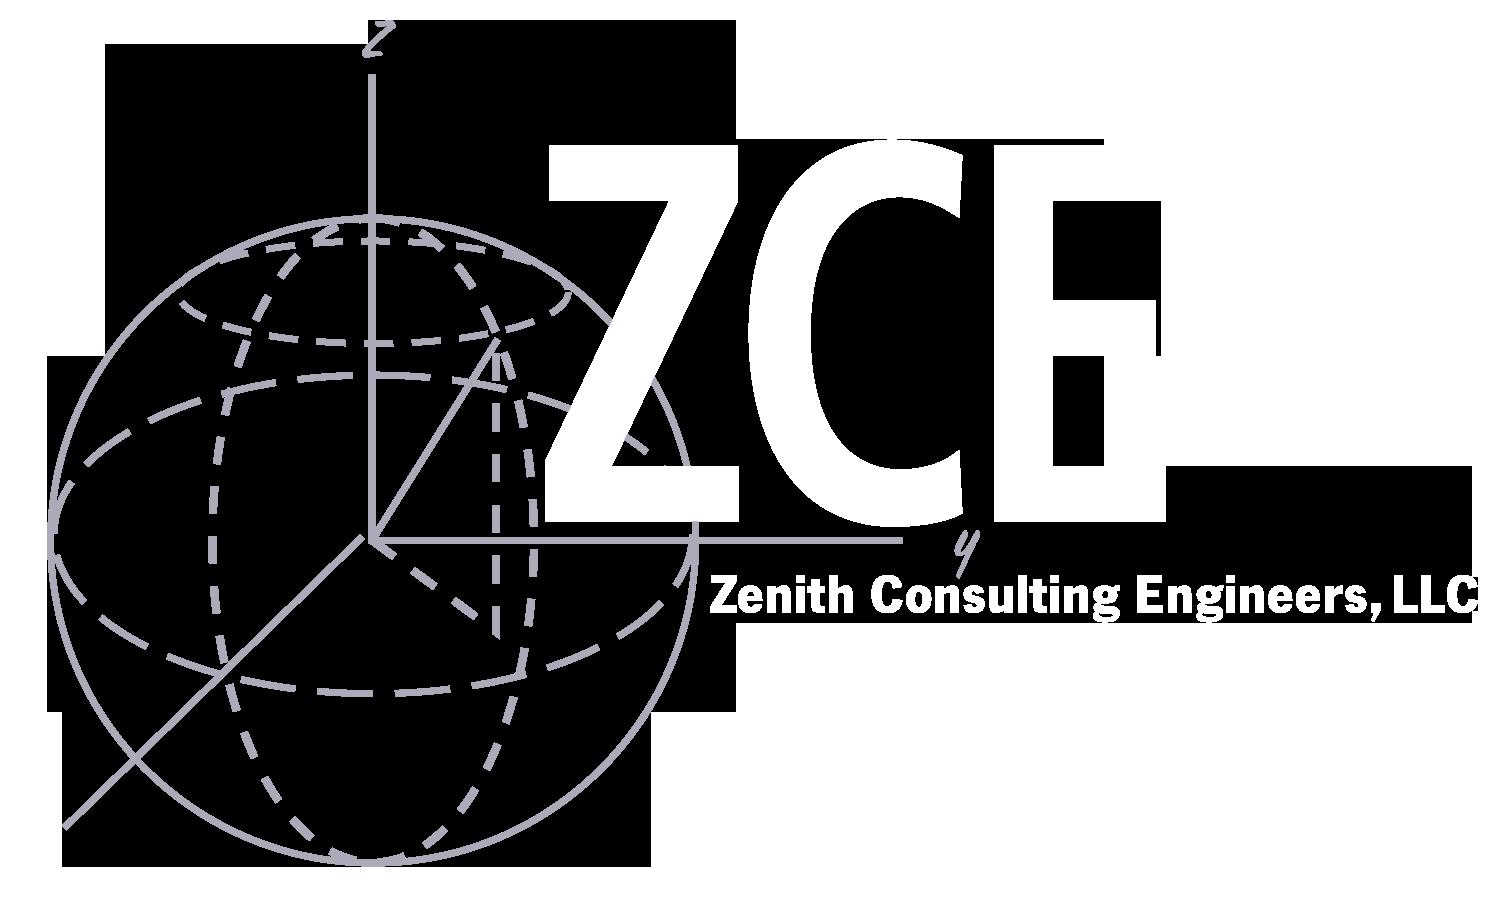 Zenith Land Surveyors